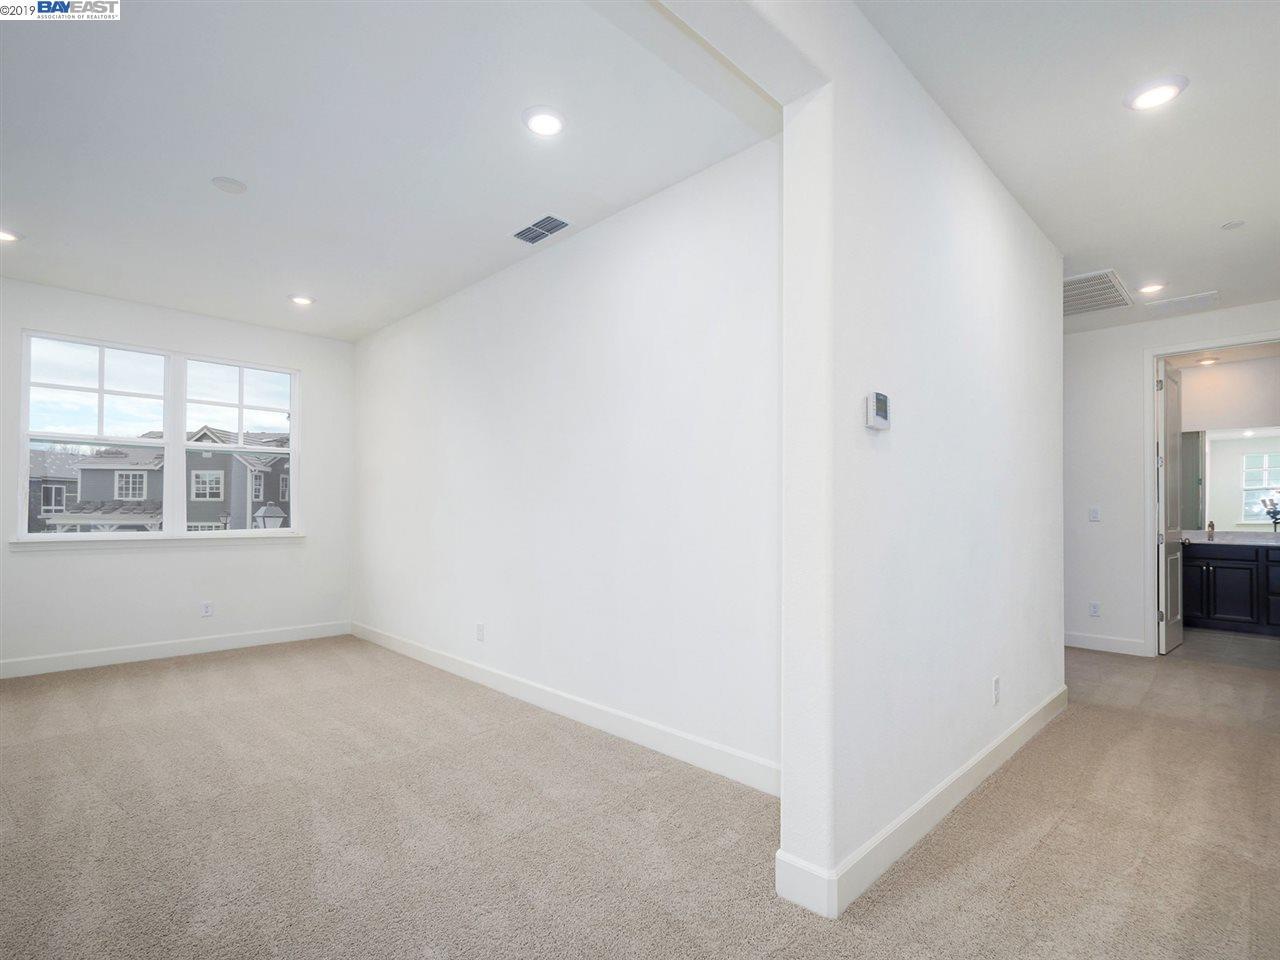 3820 Stanley Blvd, Pleasanton, CA 94566